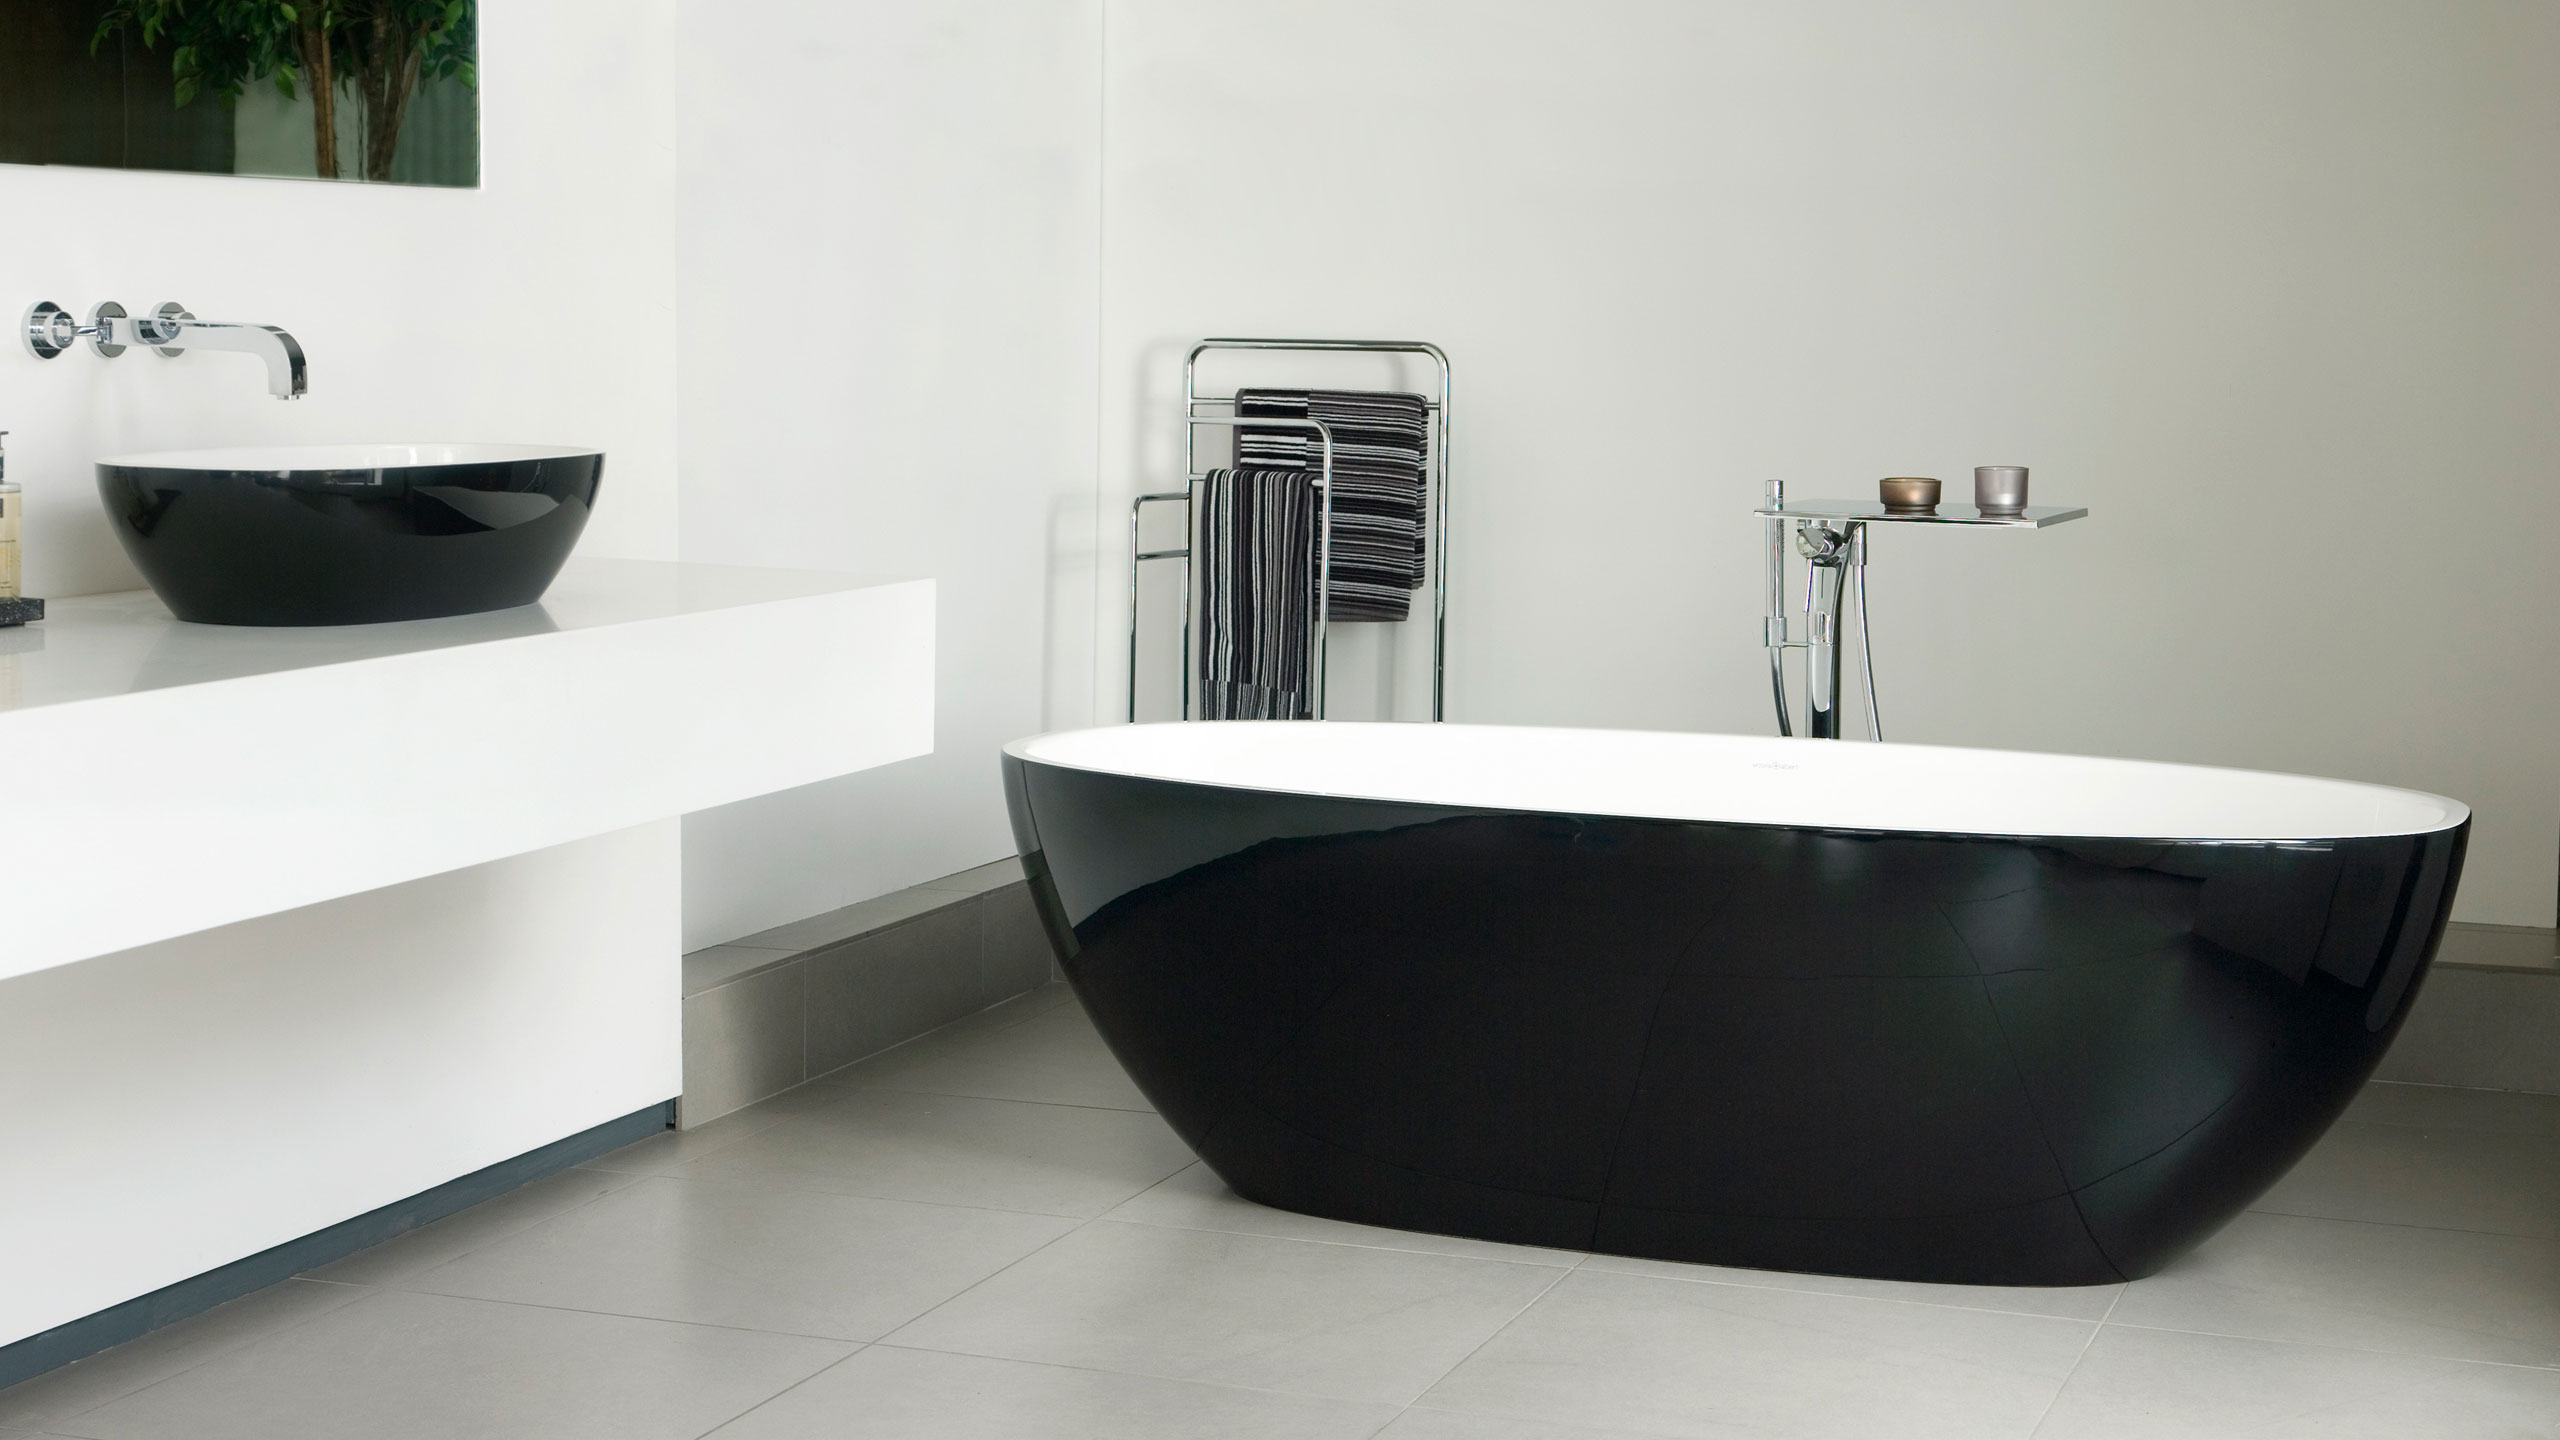 https://designerpages.s3.amazonaws.com/assets/61000851/Barcelona_Gallery_3black_EU.jpg